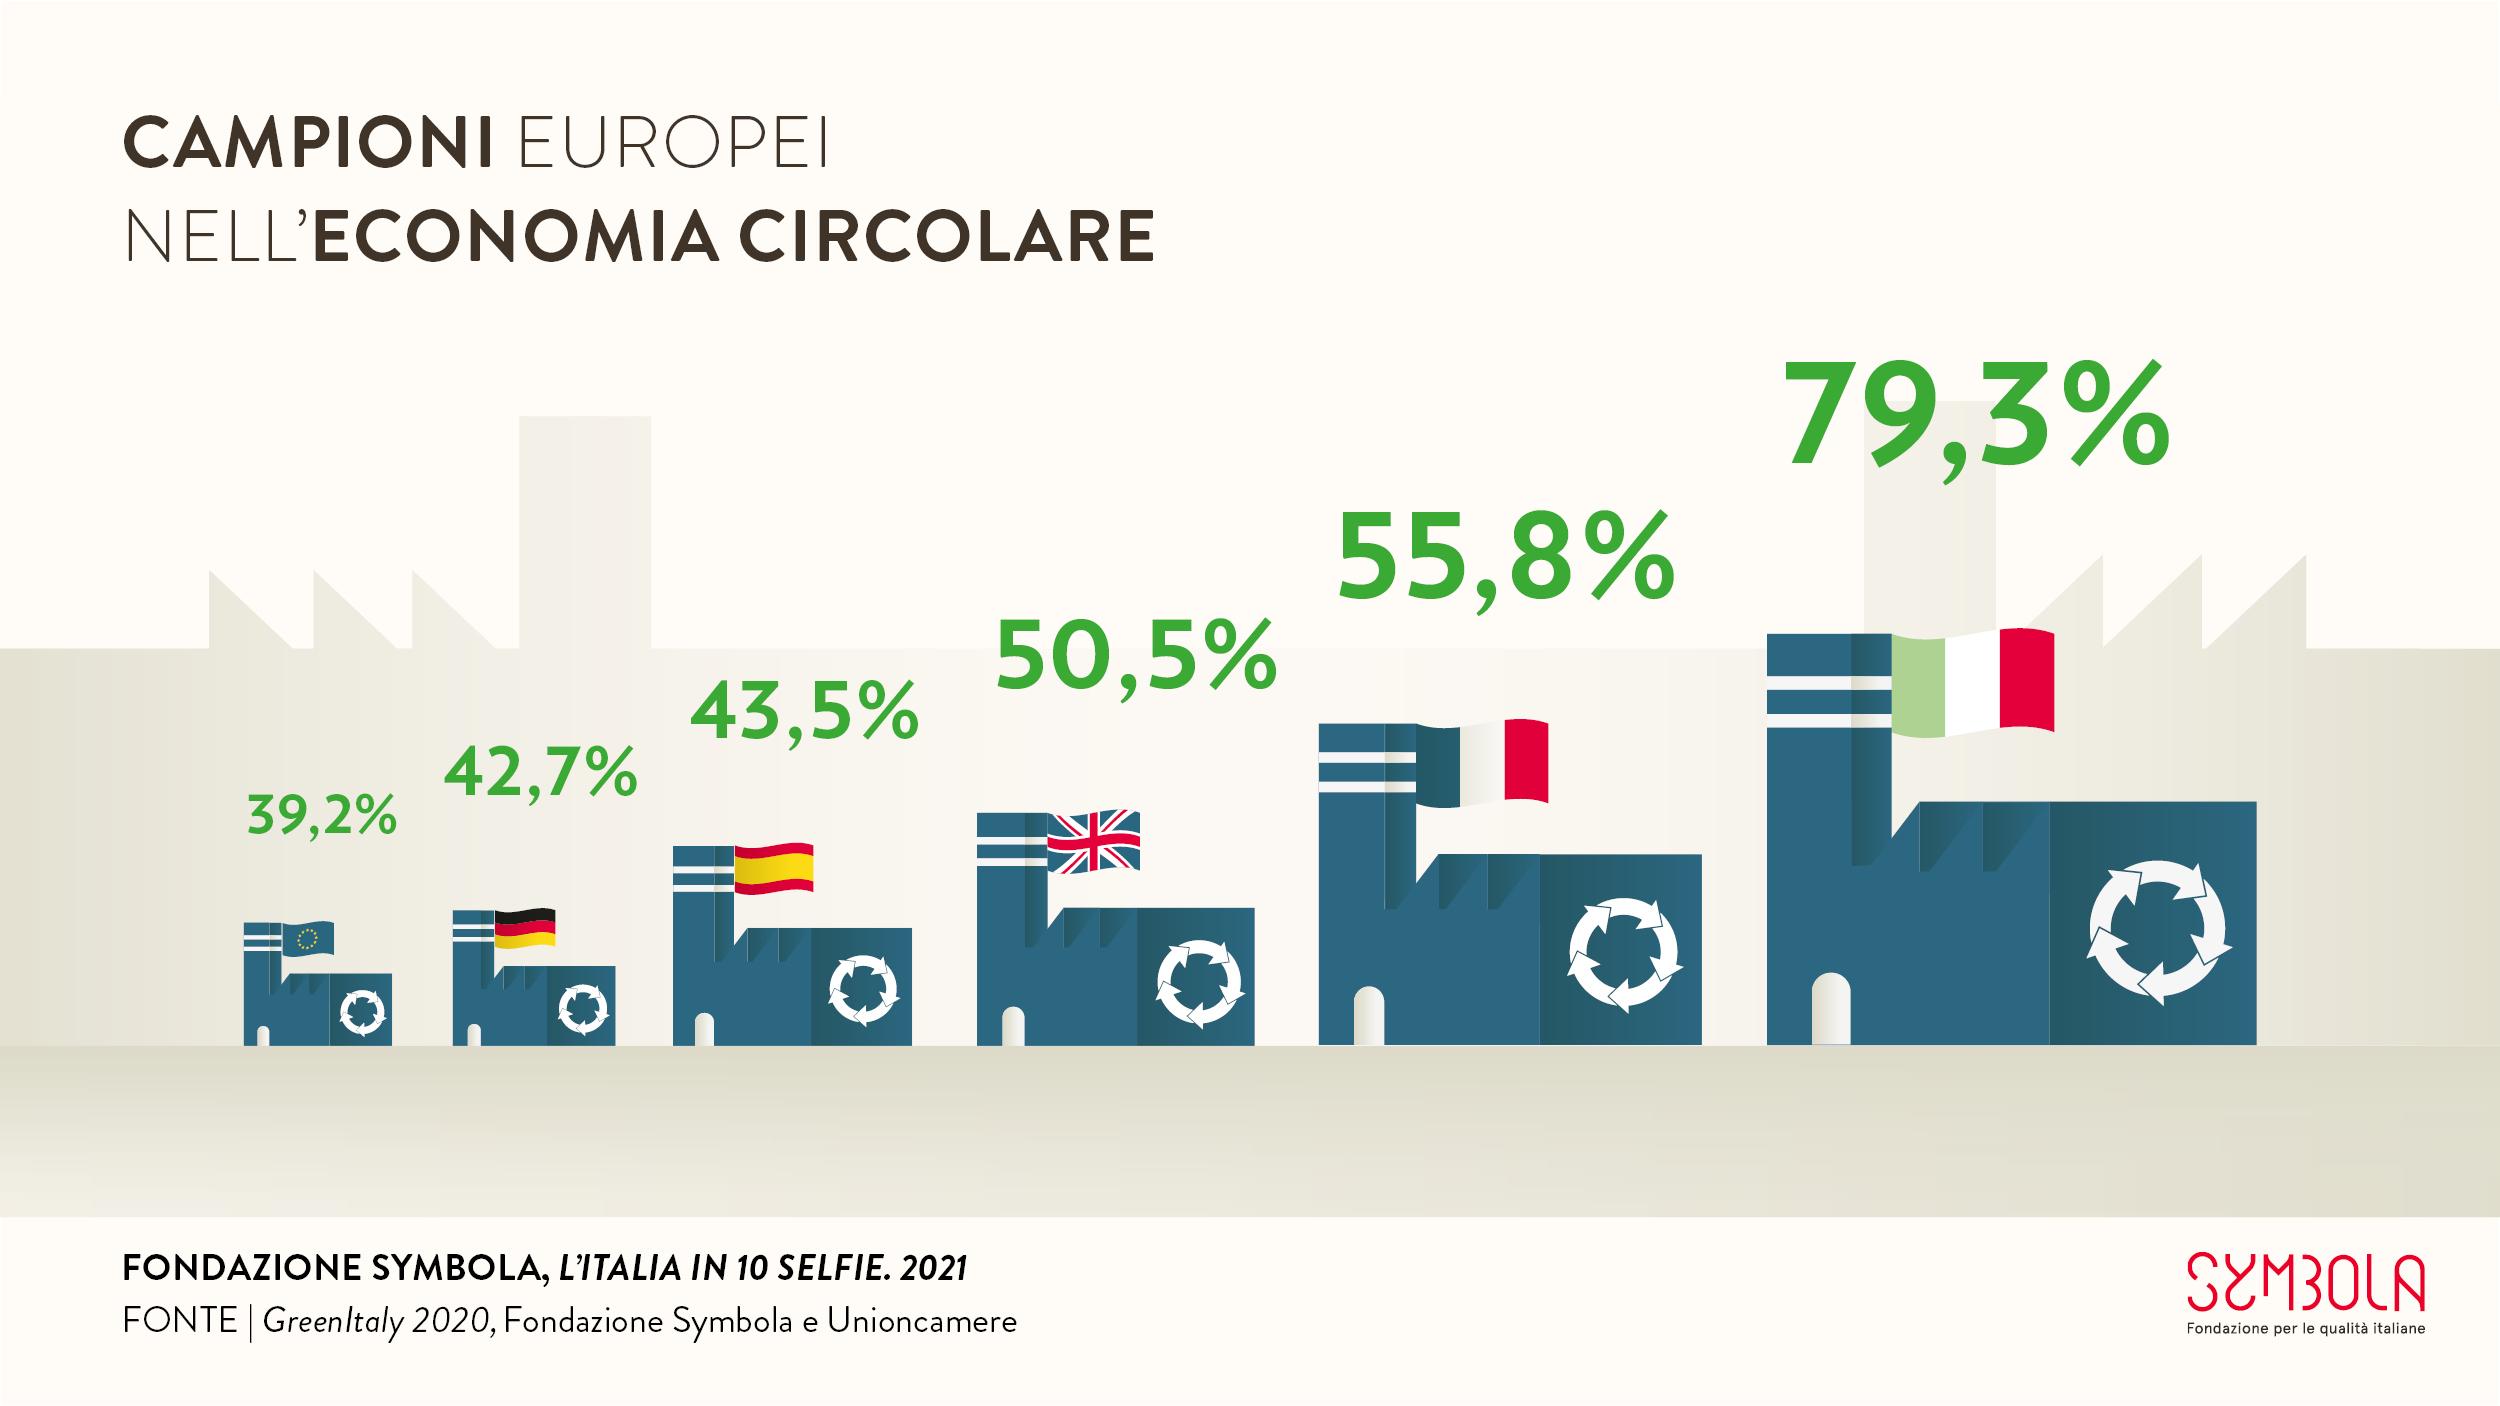 10 Selfie 2021: Campioni europei nell'economia circolare #1